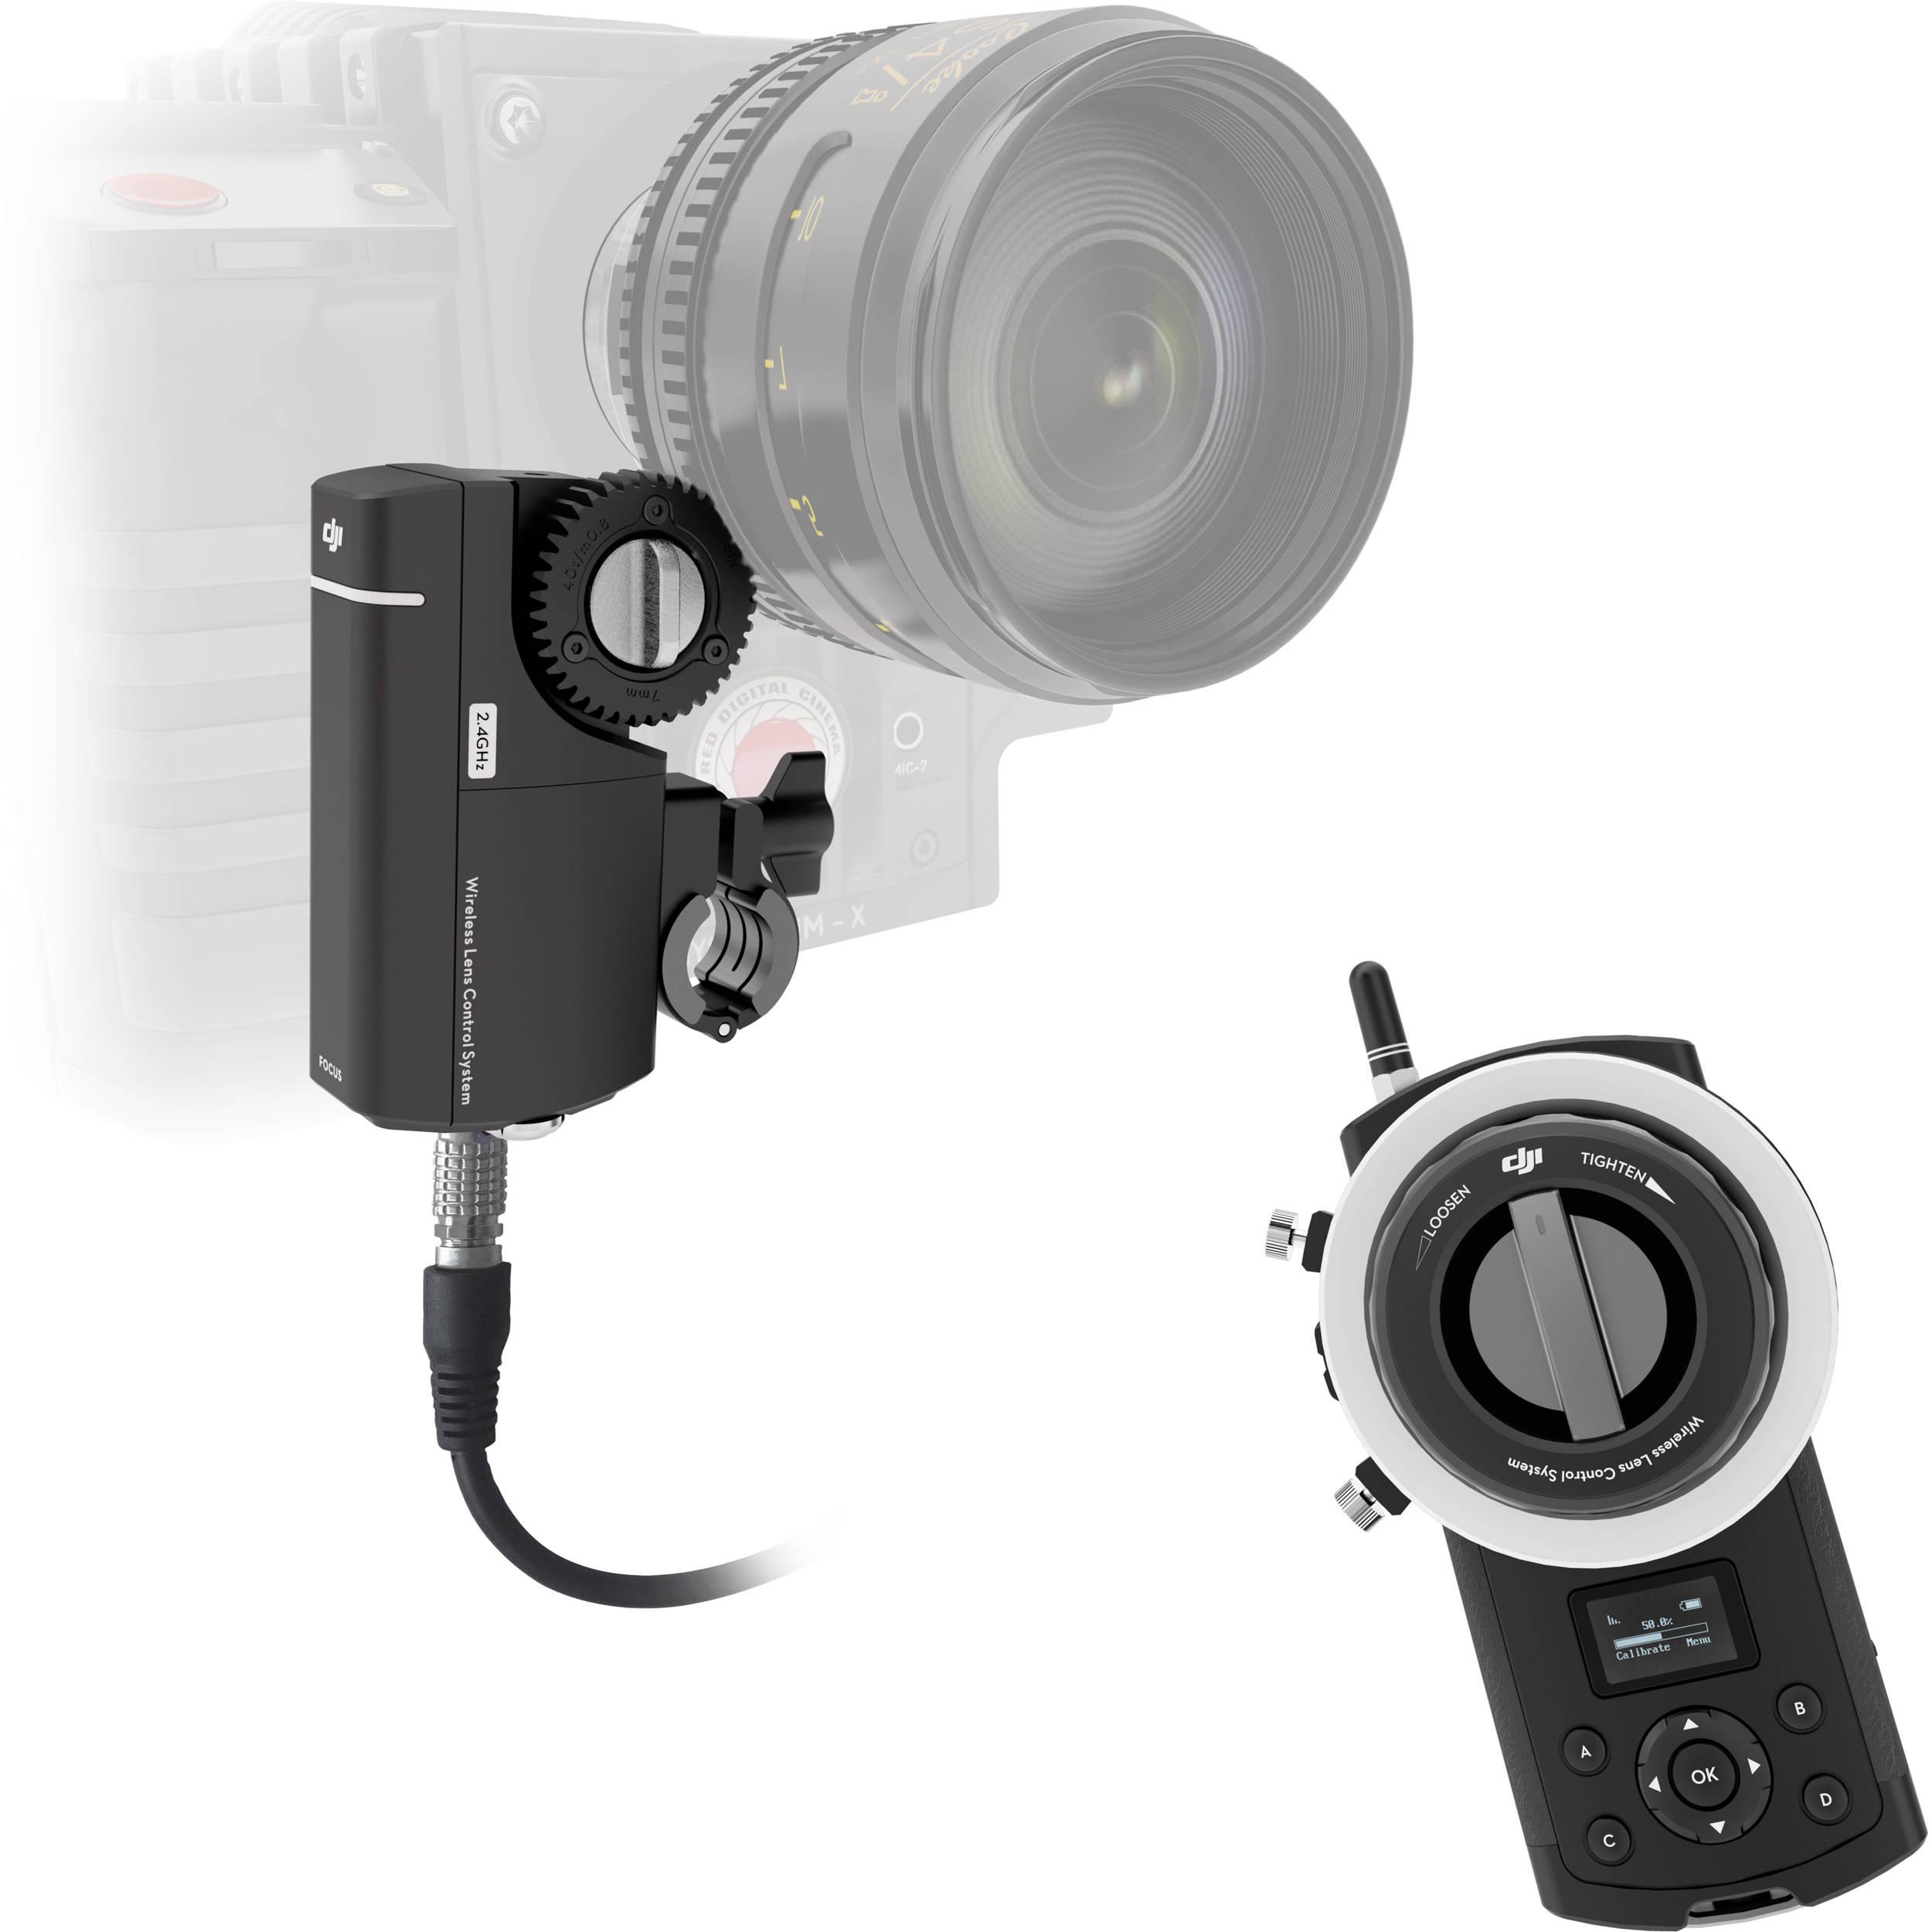 Dji Focus Wireless Follow Focus System Cp Zm 000234 B Amp H Photo